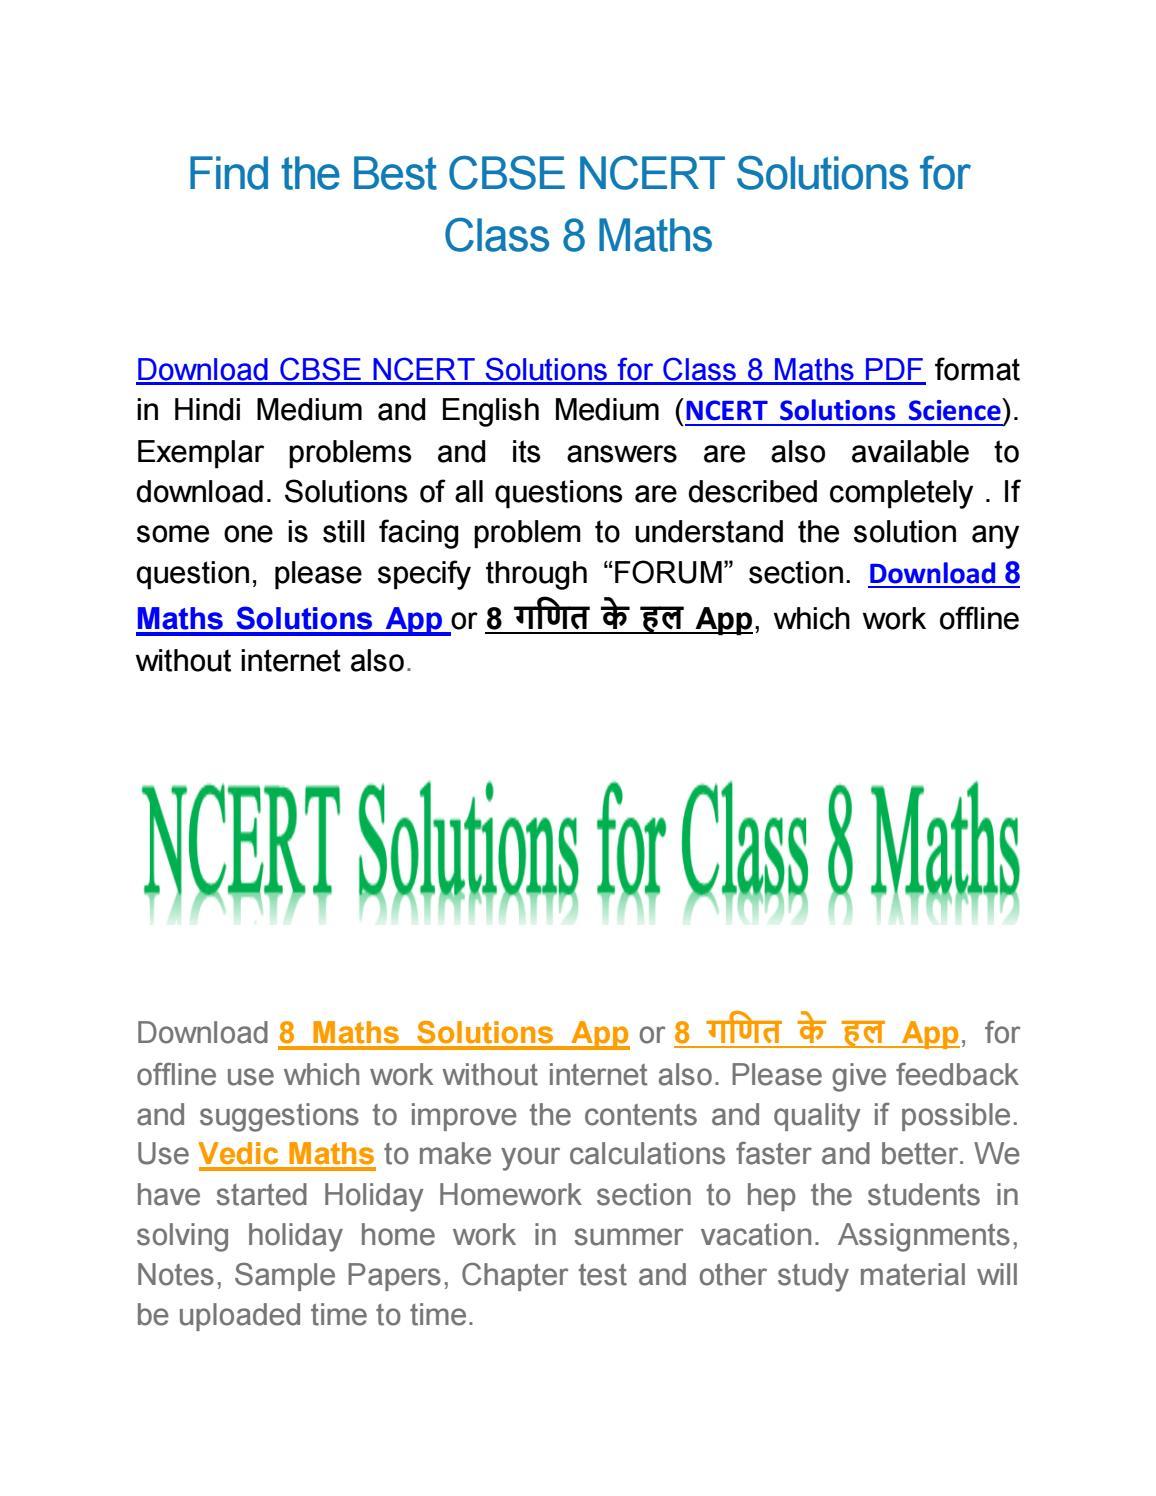 Class 8 Maths Notes Pdf Download